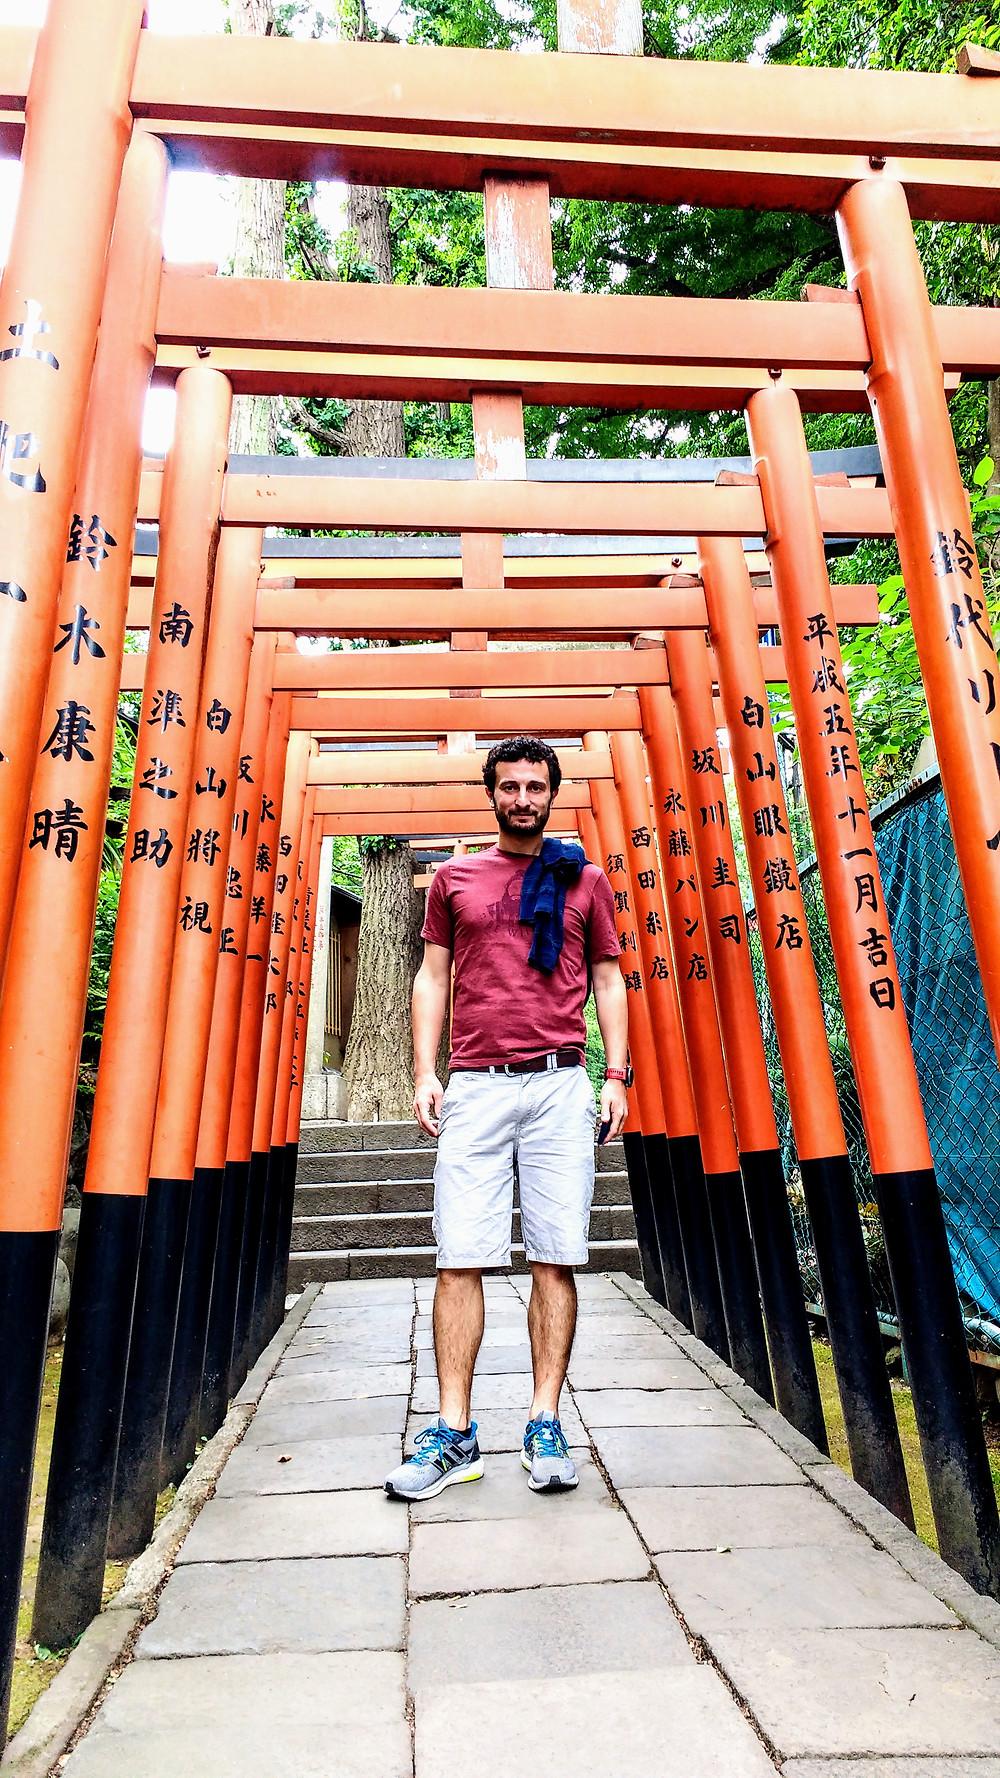 Tori en un templo budista en Tokio